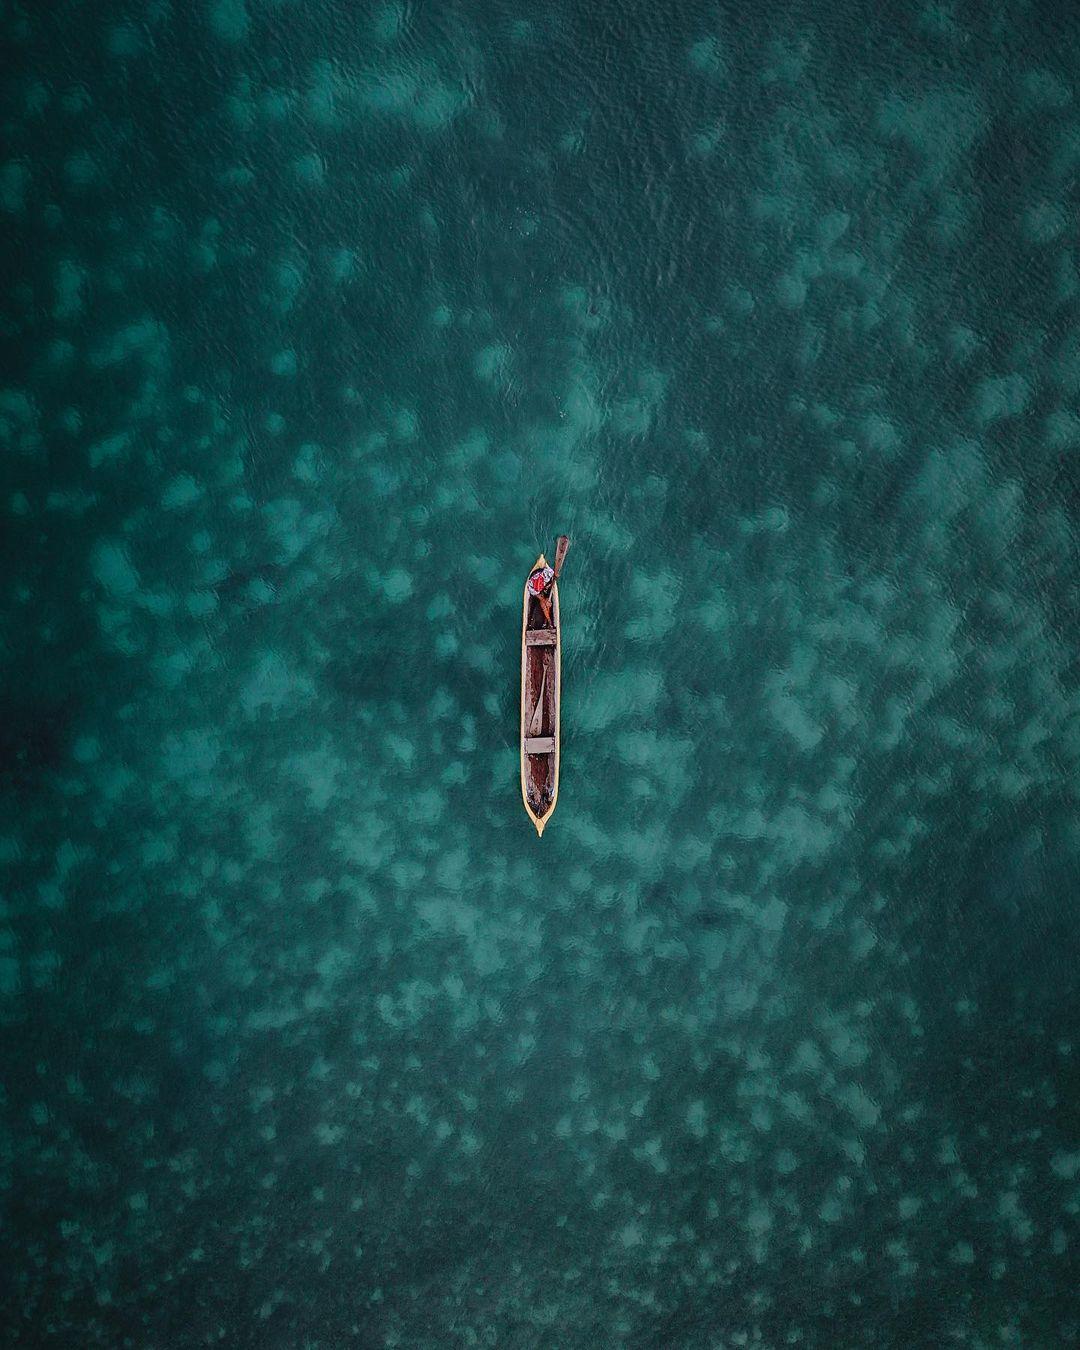 Природа и путешествия на снимках Сиарда Бракке